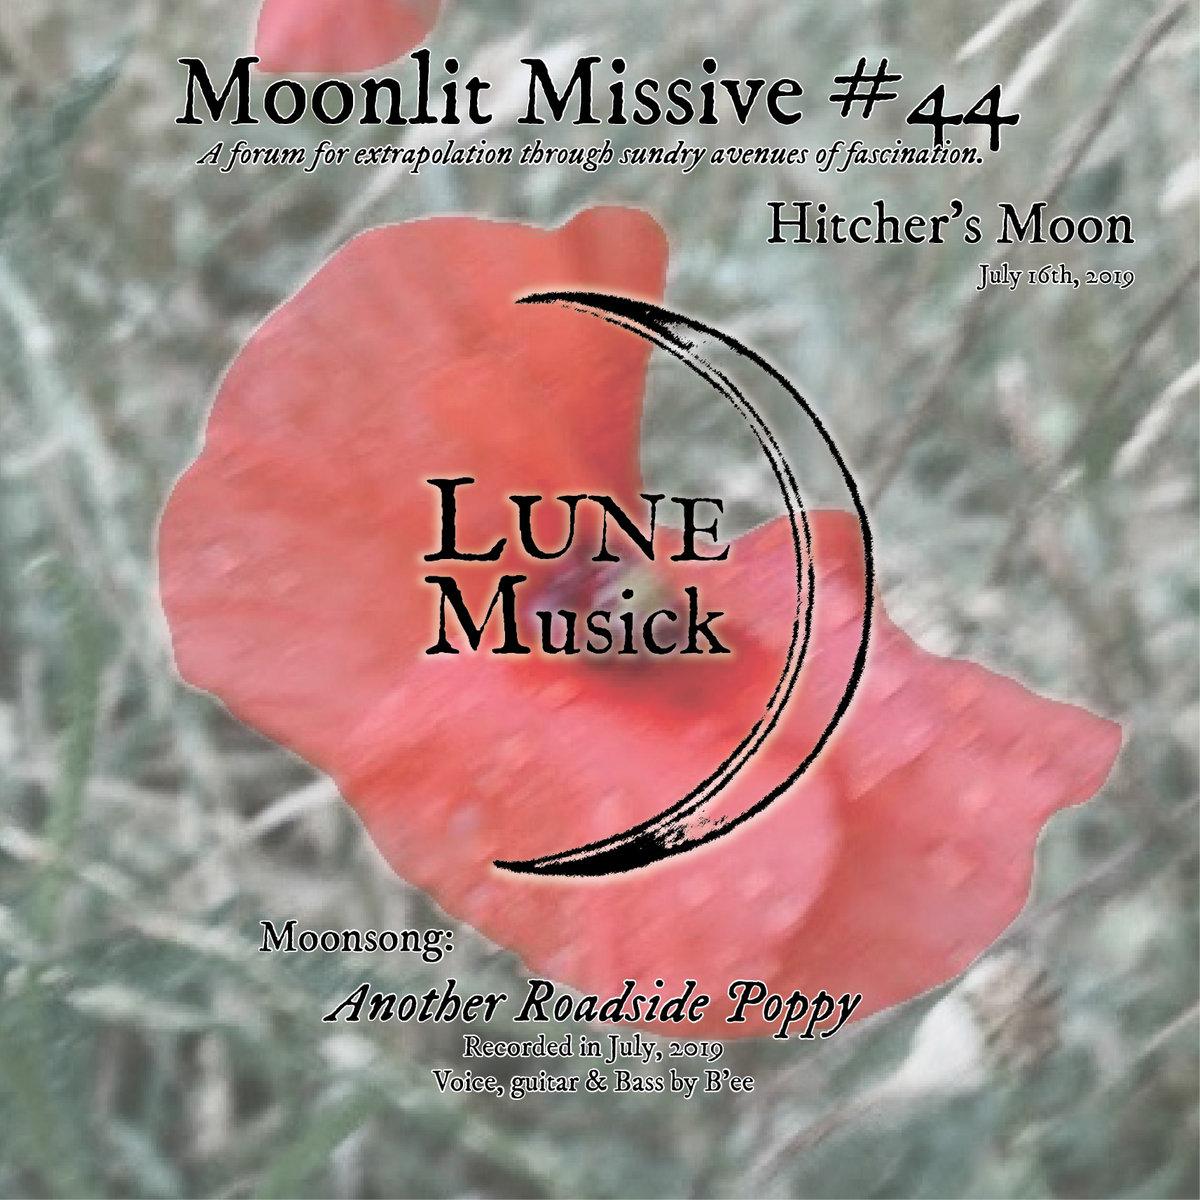 Moonlit Missive #44 | In Gowan Ring